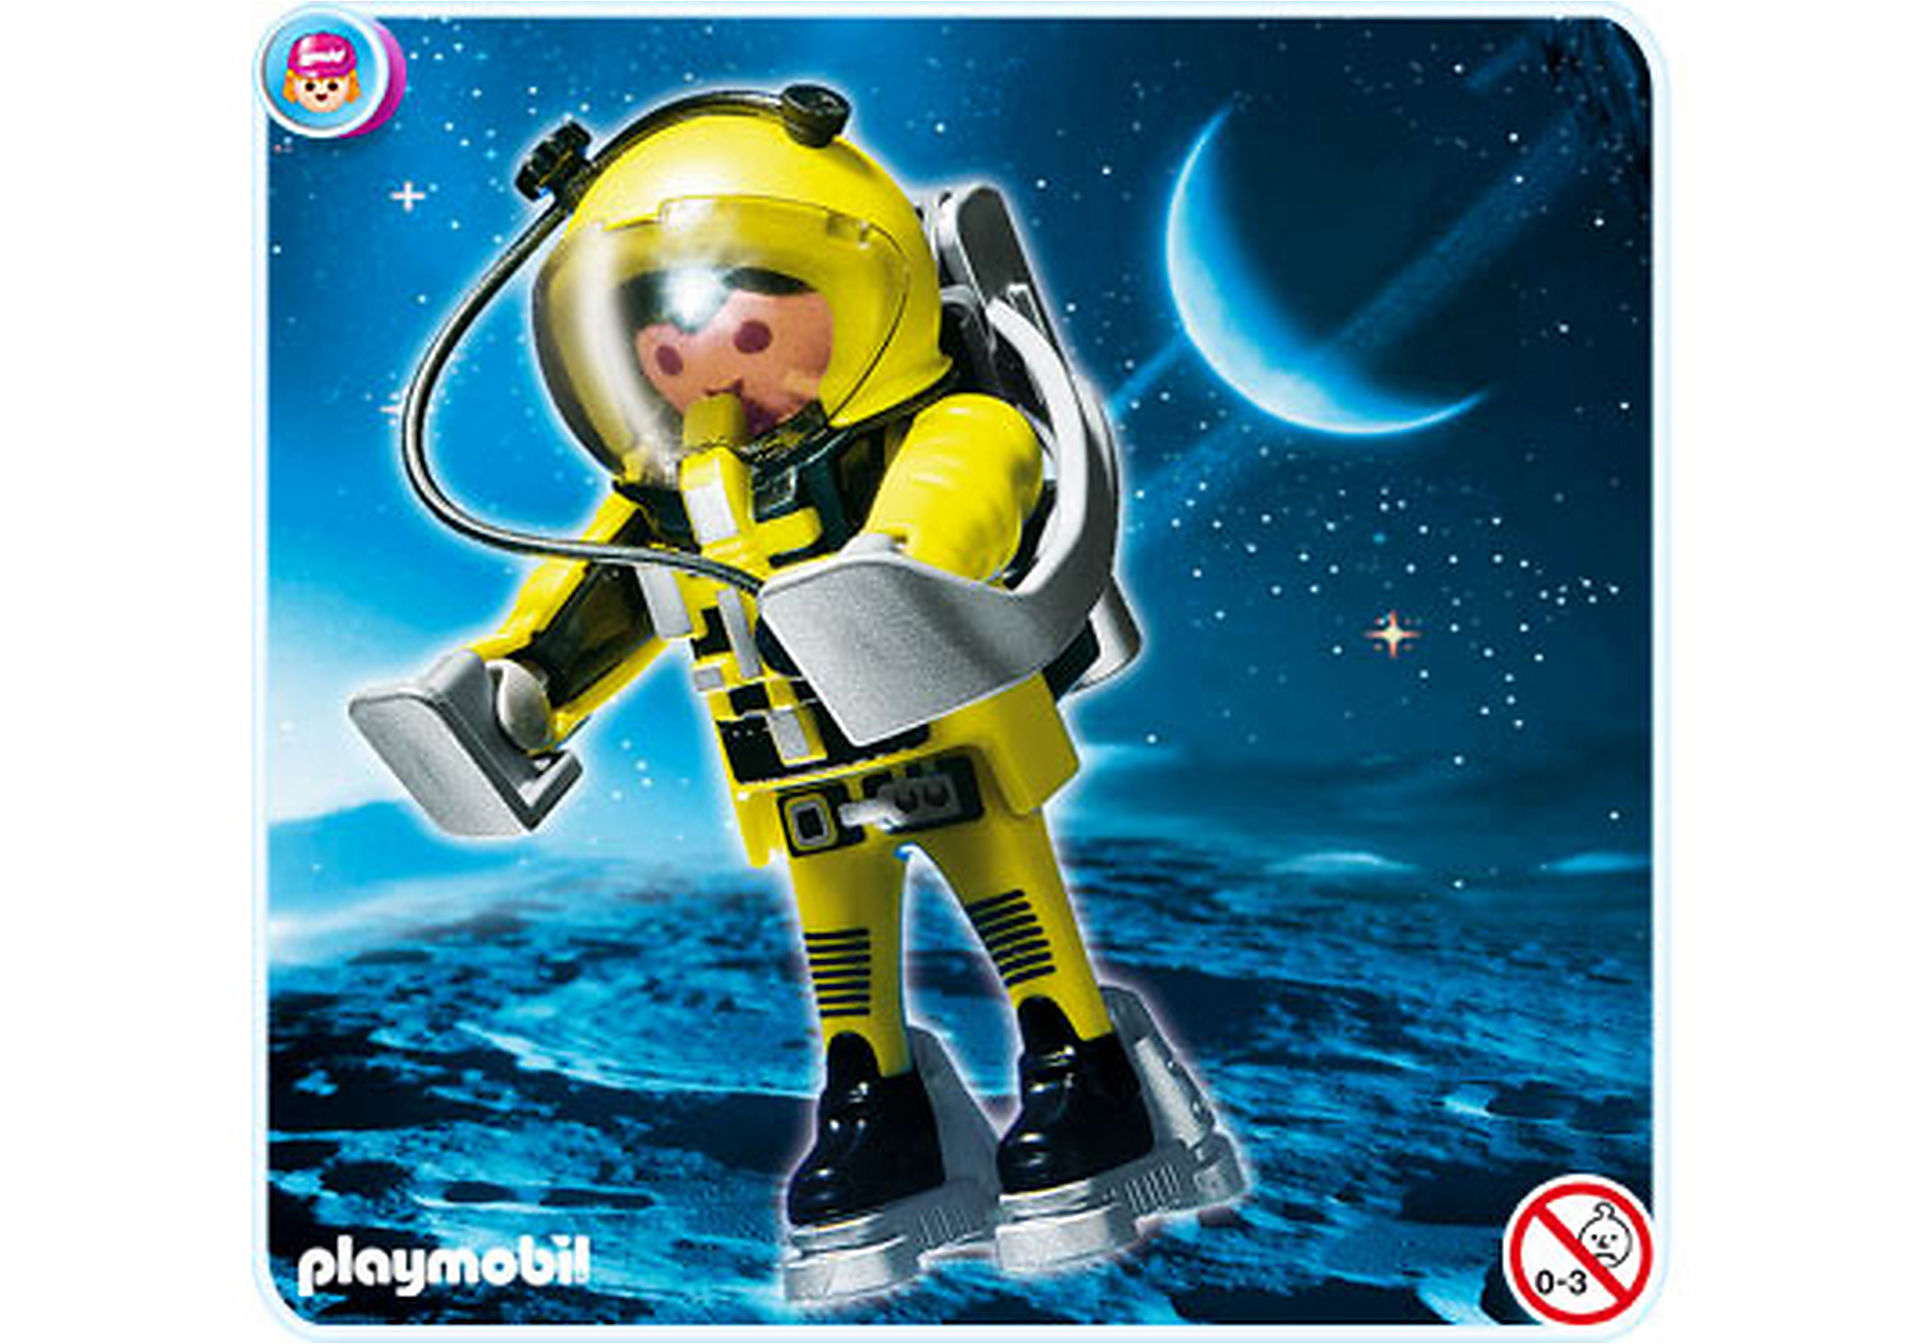 http://media.playmobil.com/i/playmobil/4747-A_product_detail/Astronaut